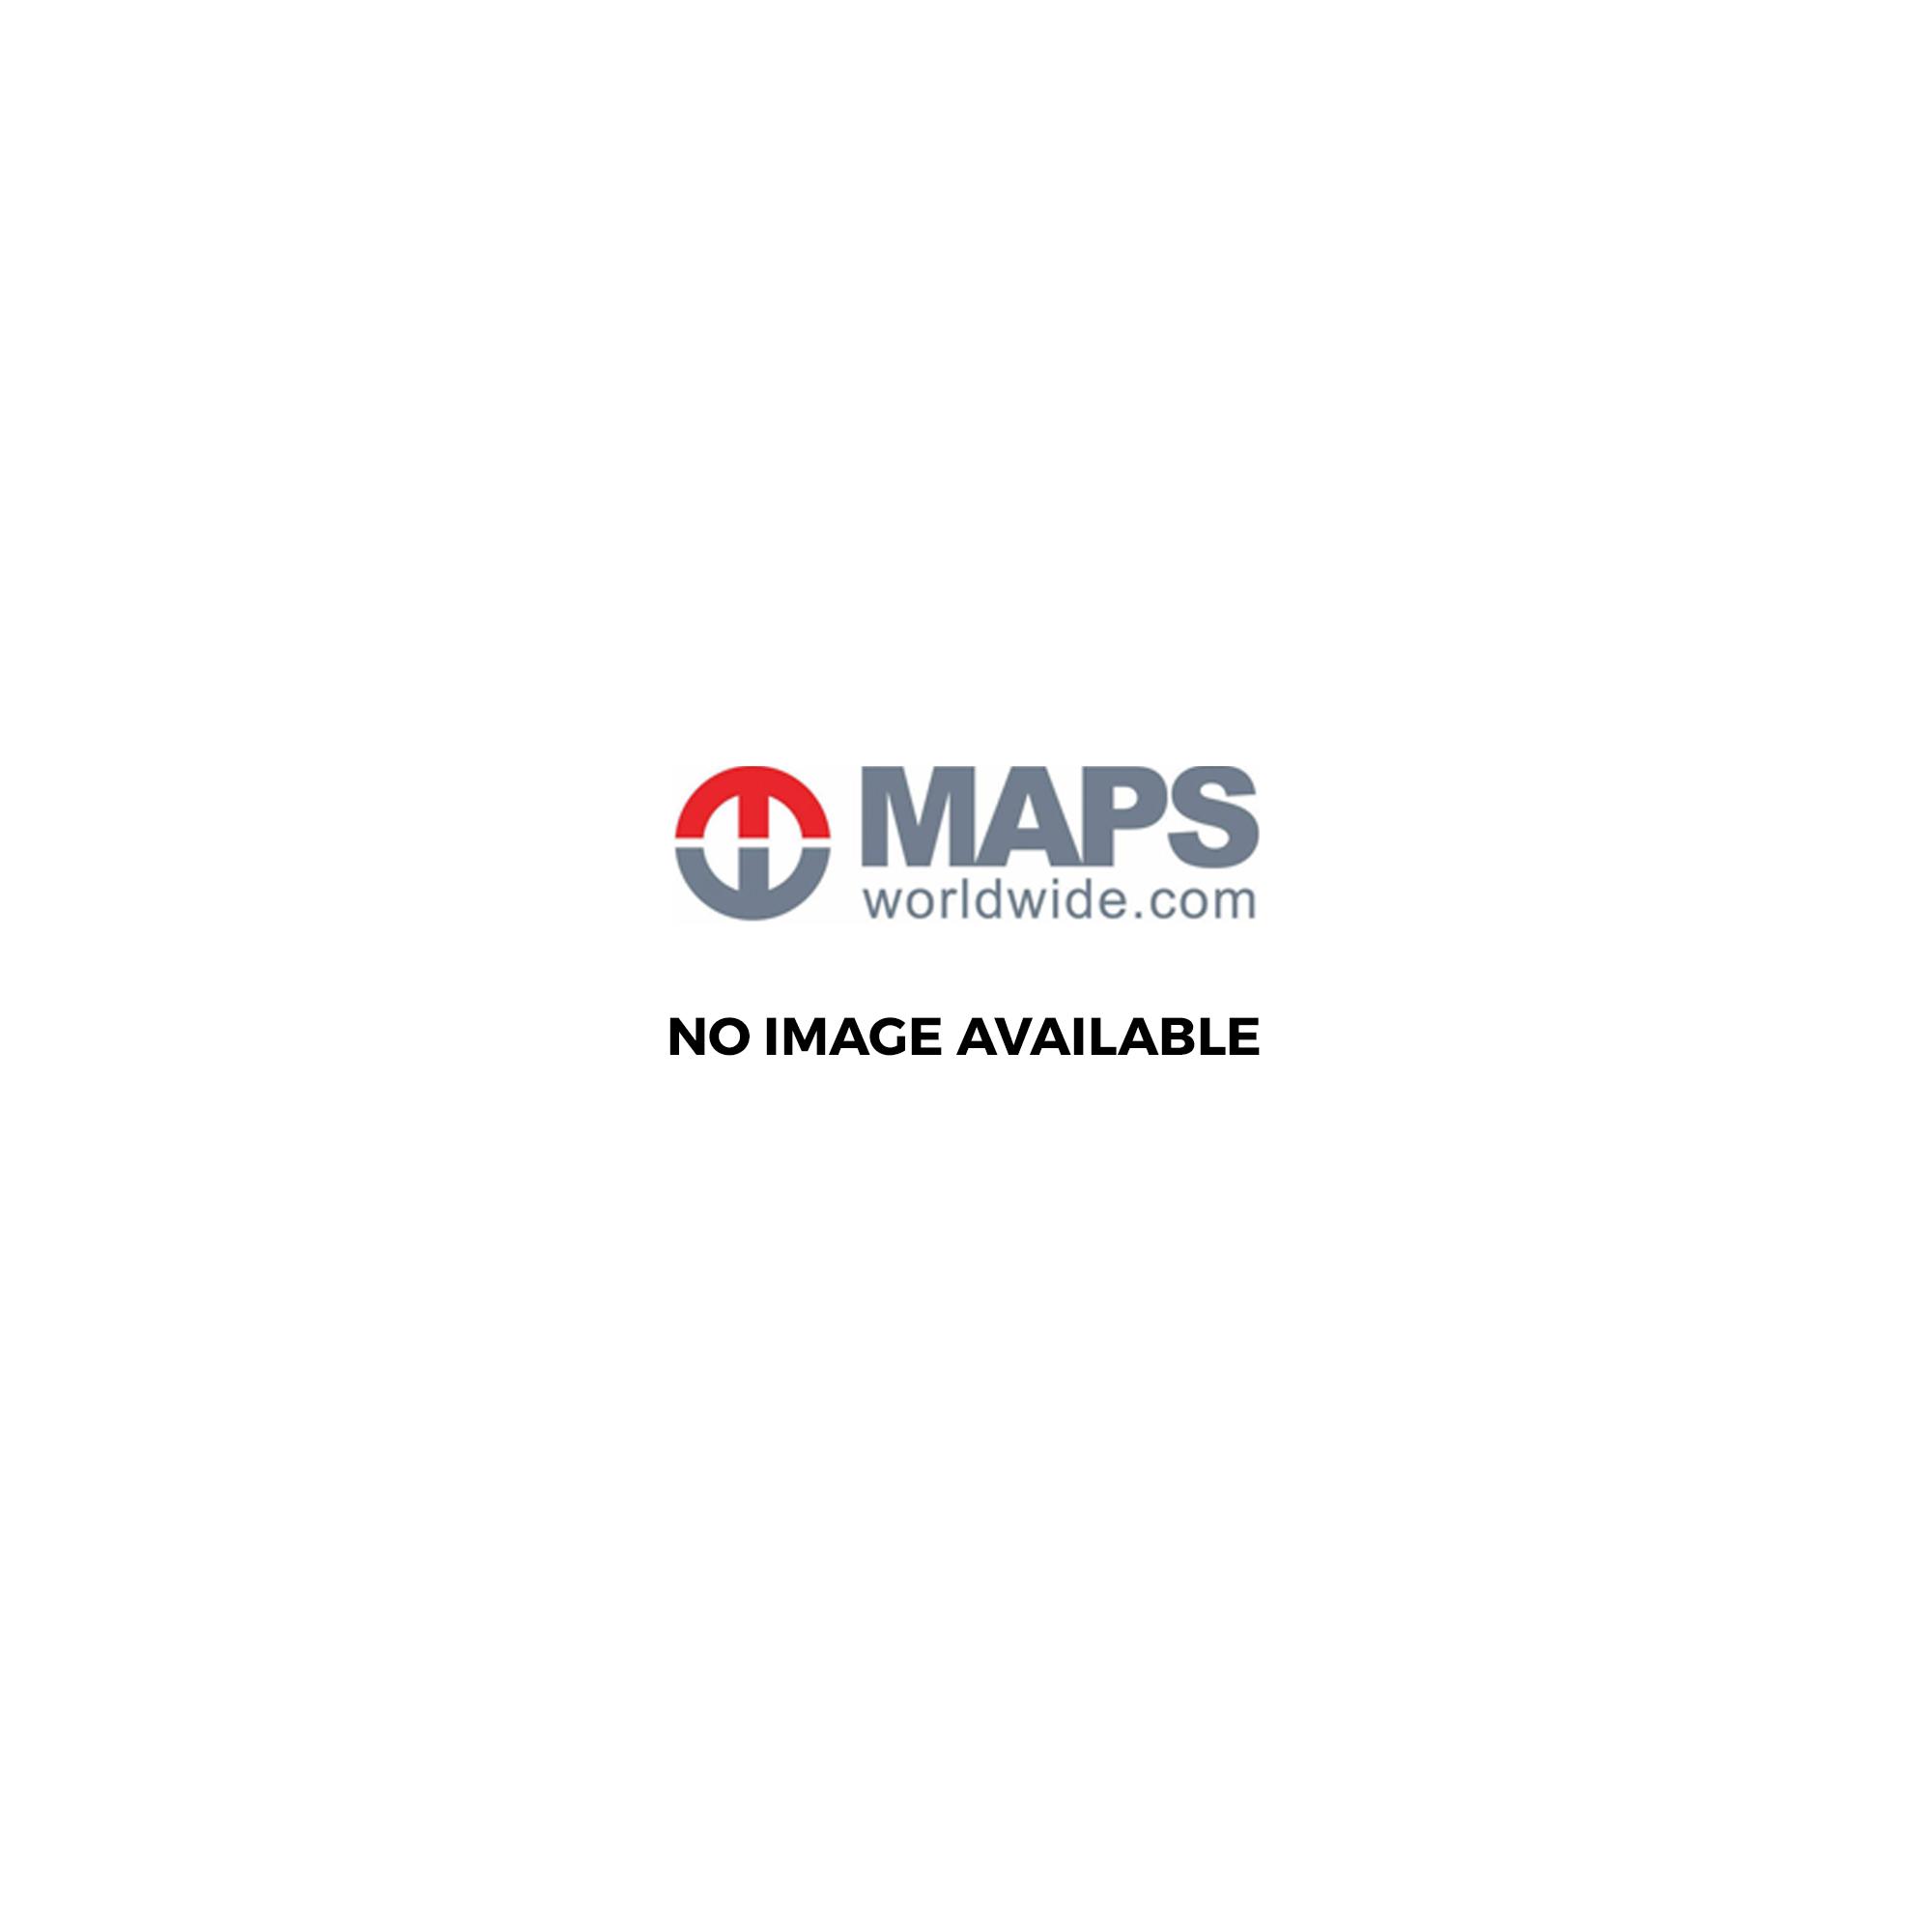 nordeca kart Meraker Sor Tourist Map: 2742   Europe from Maps Worldwide UK nordeca kart